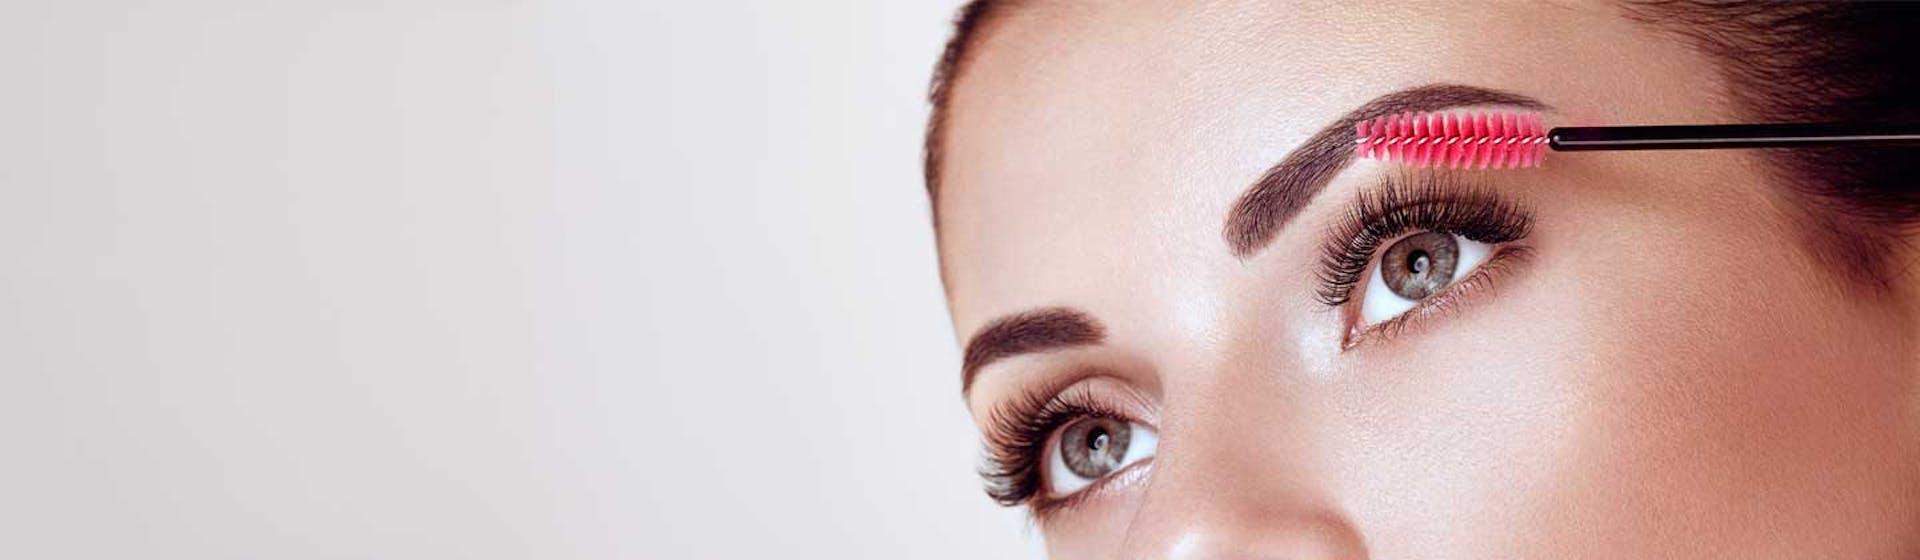 Maquillaje para principiantes: 10 tips esenciales para convertirte en todo un make-up artist